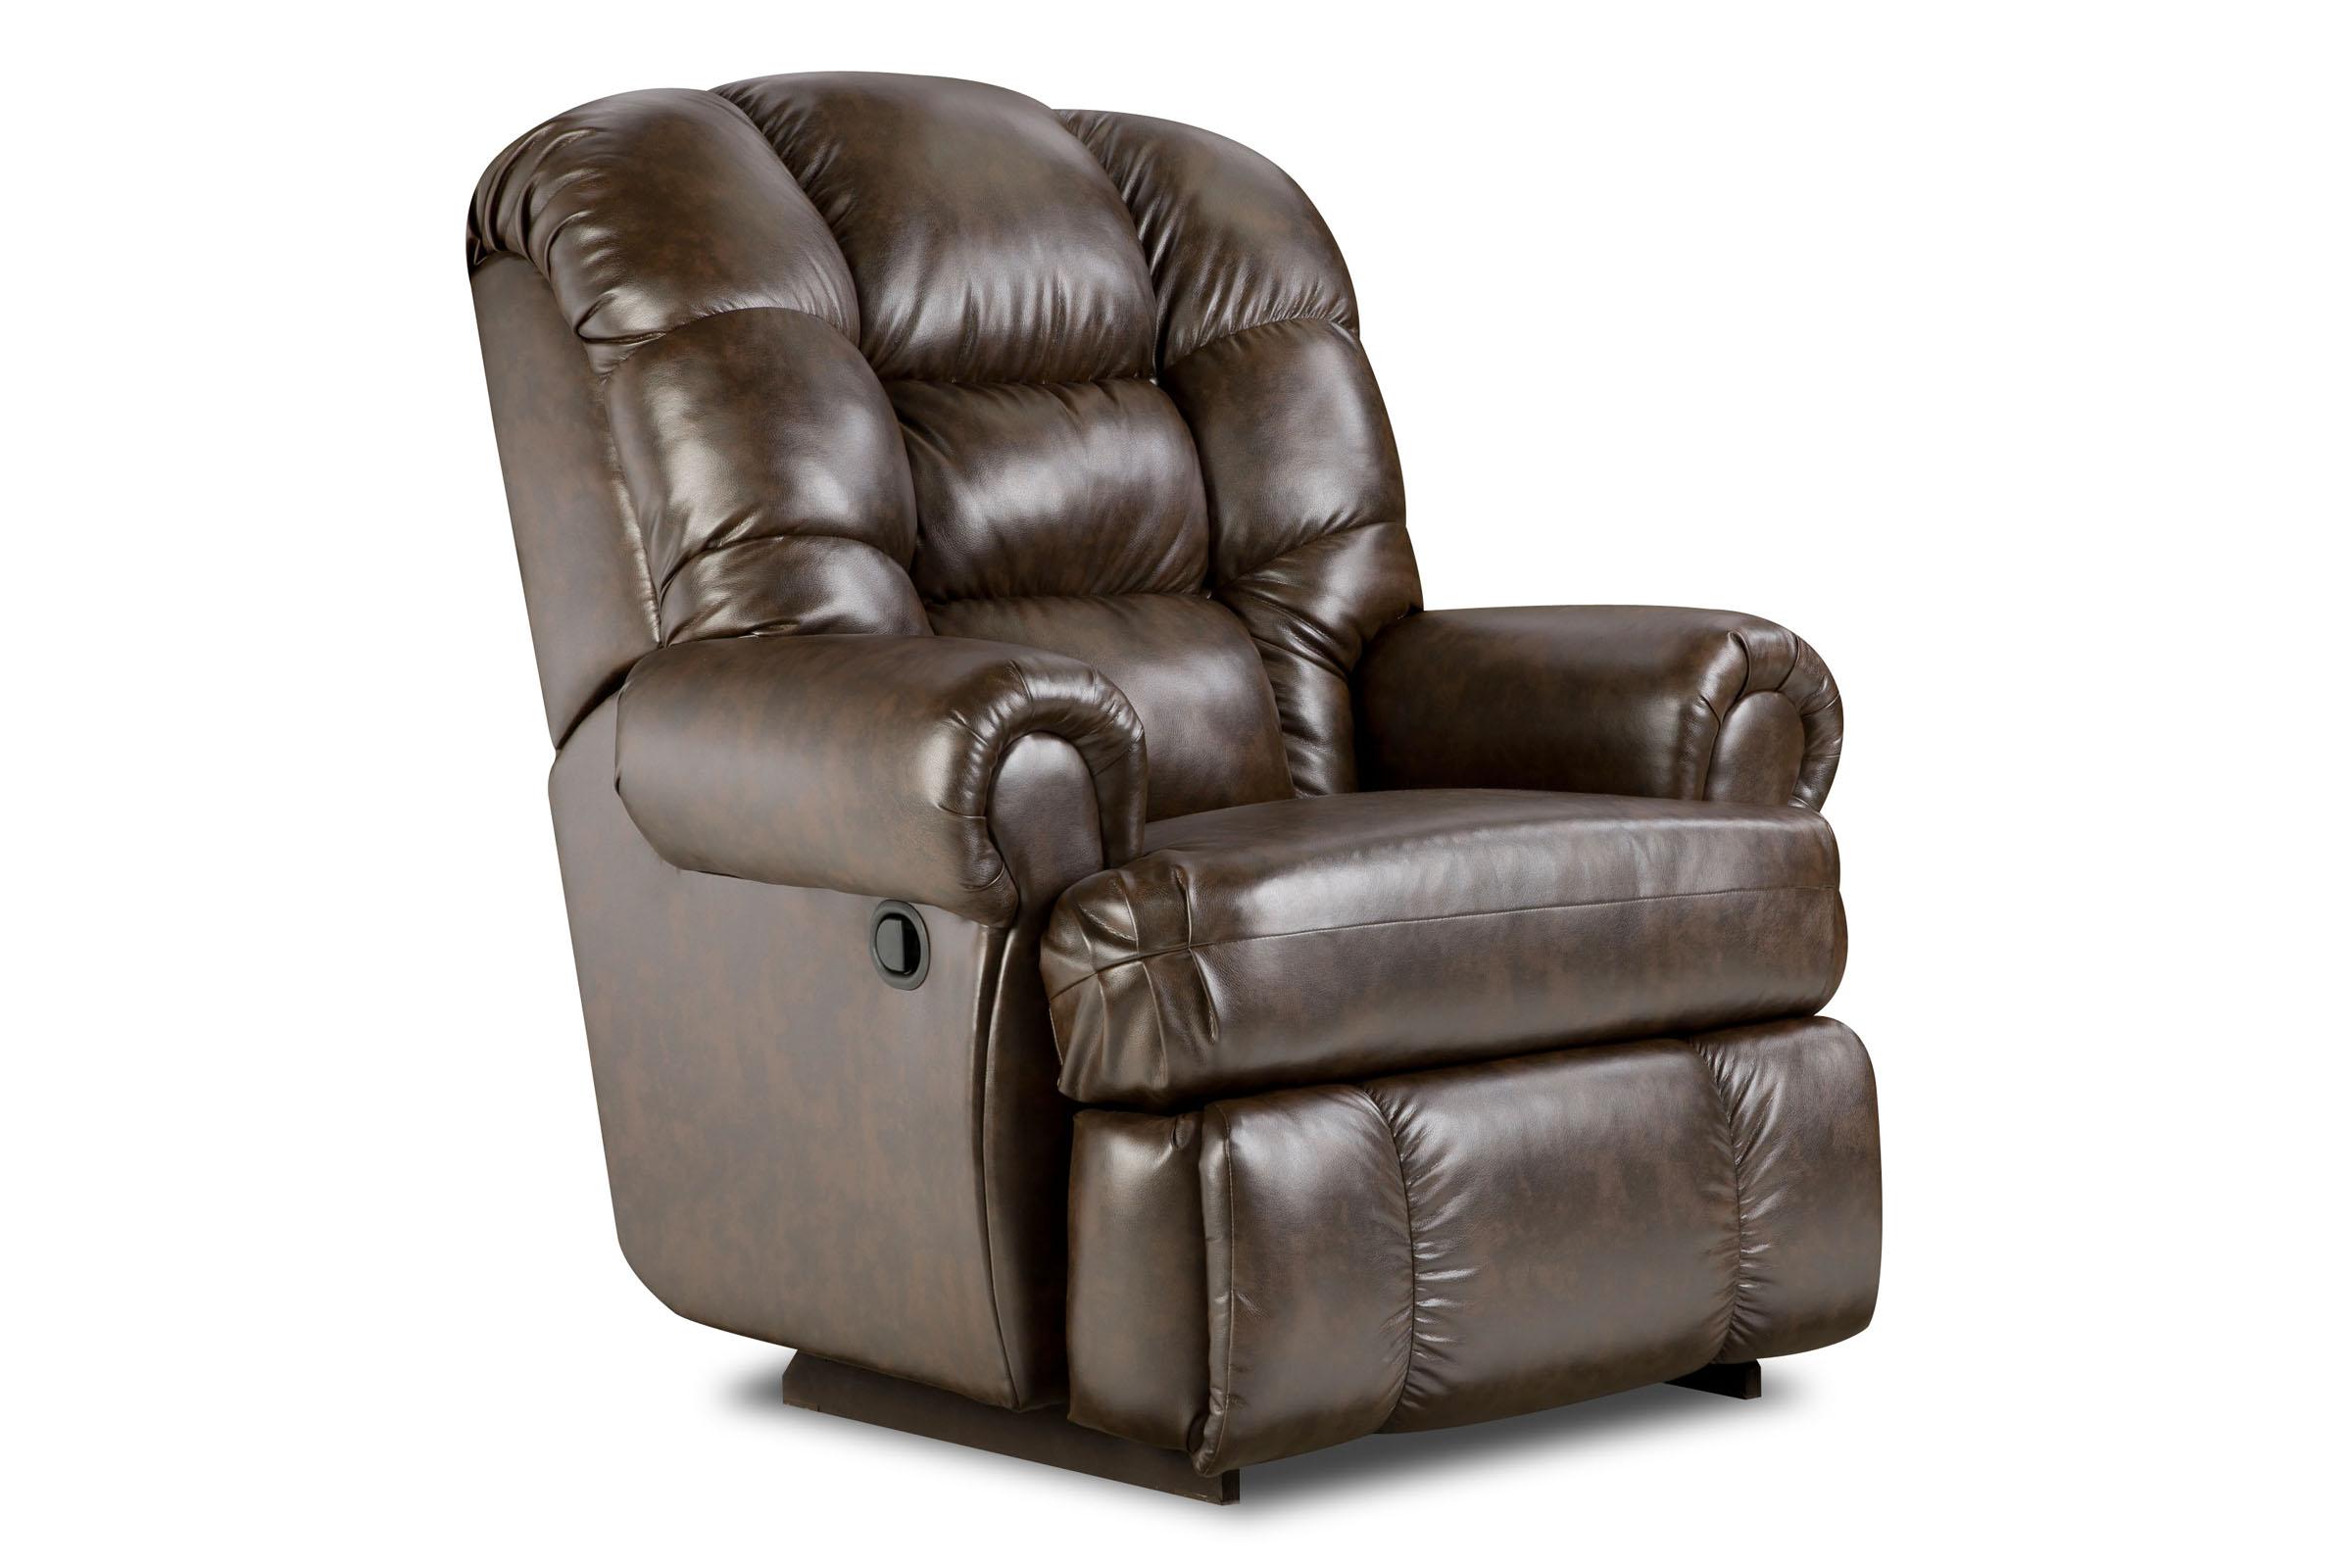 sc 1 st  Gardner-White Furniture & Big Man Leather Recliner islam-shia.org